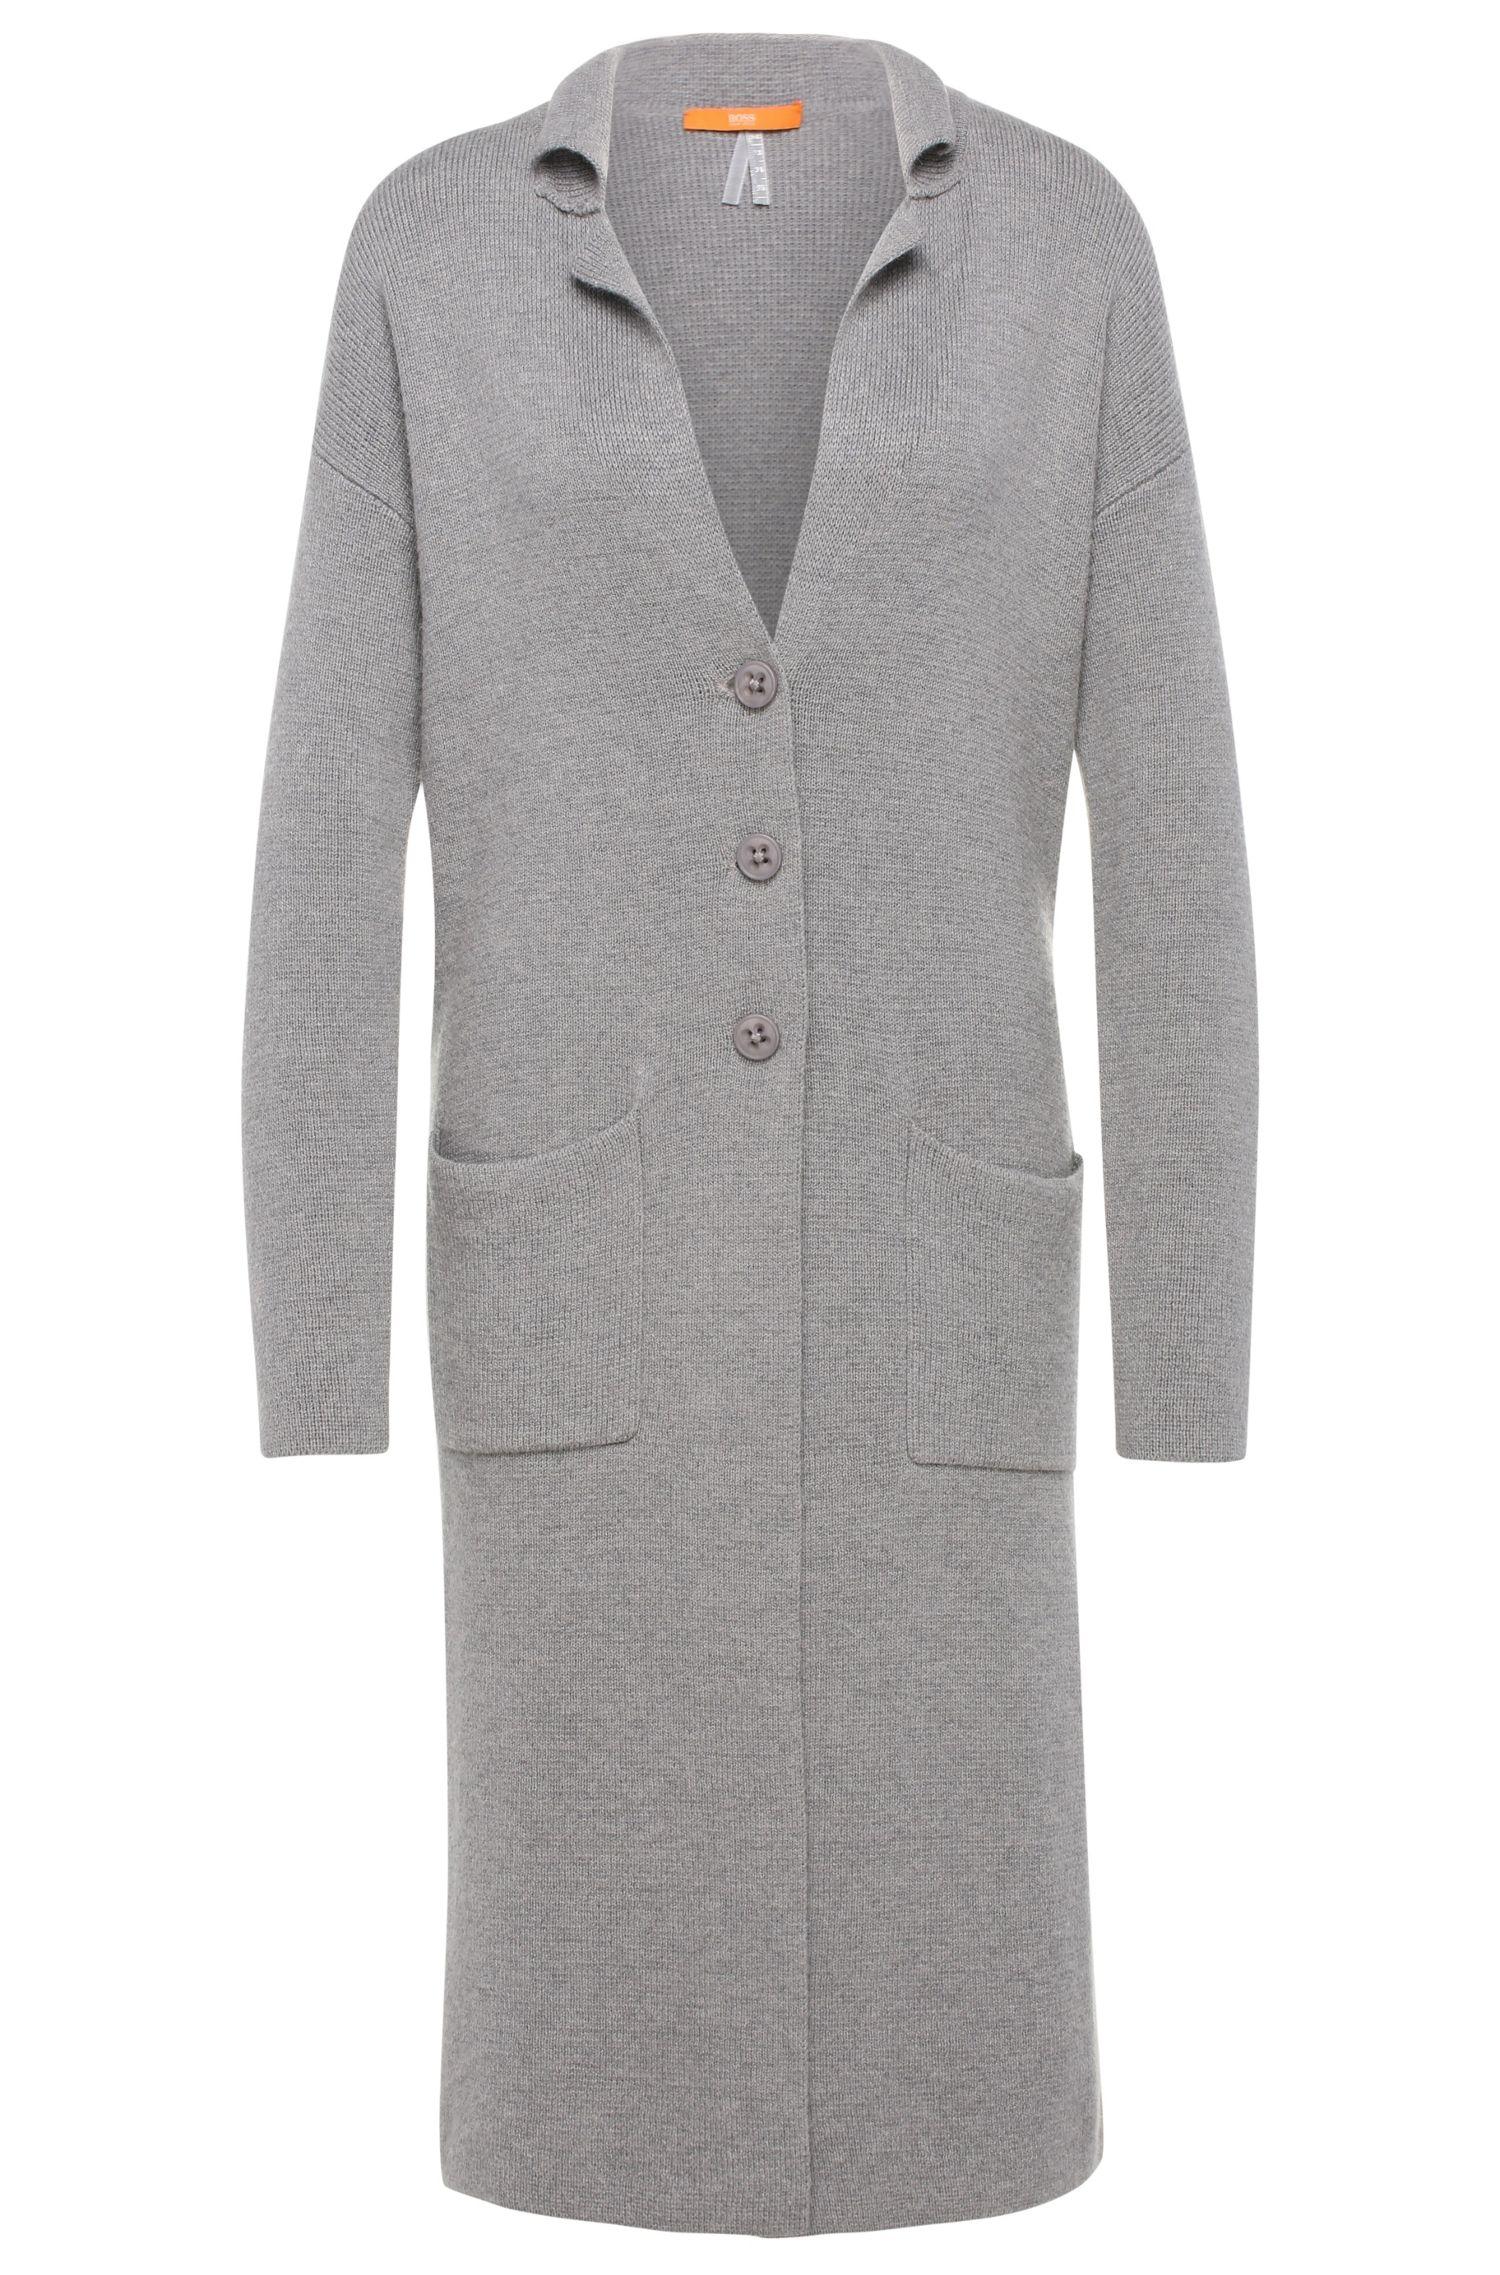 Langer Comfort-Fit Cardigan aus Baumwoll-Mix mit Seide: ´Ilvanova`